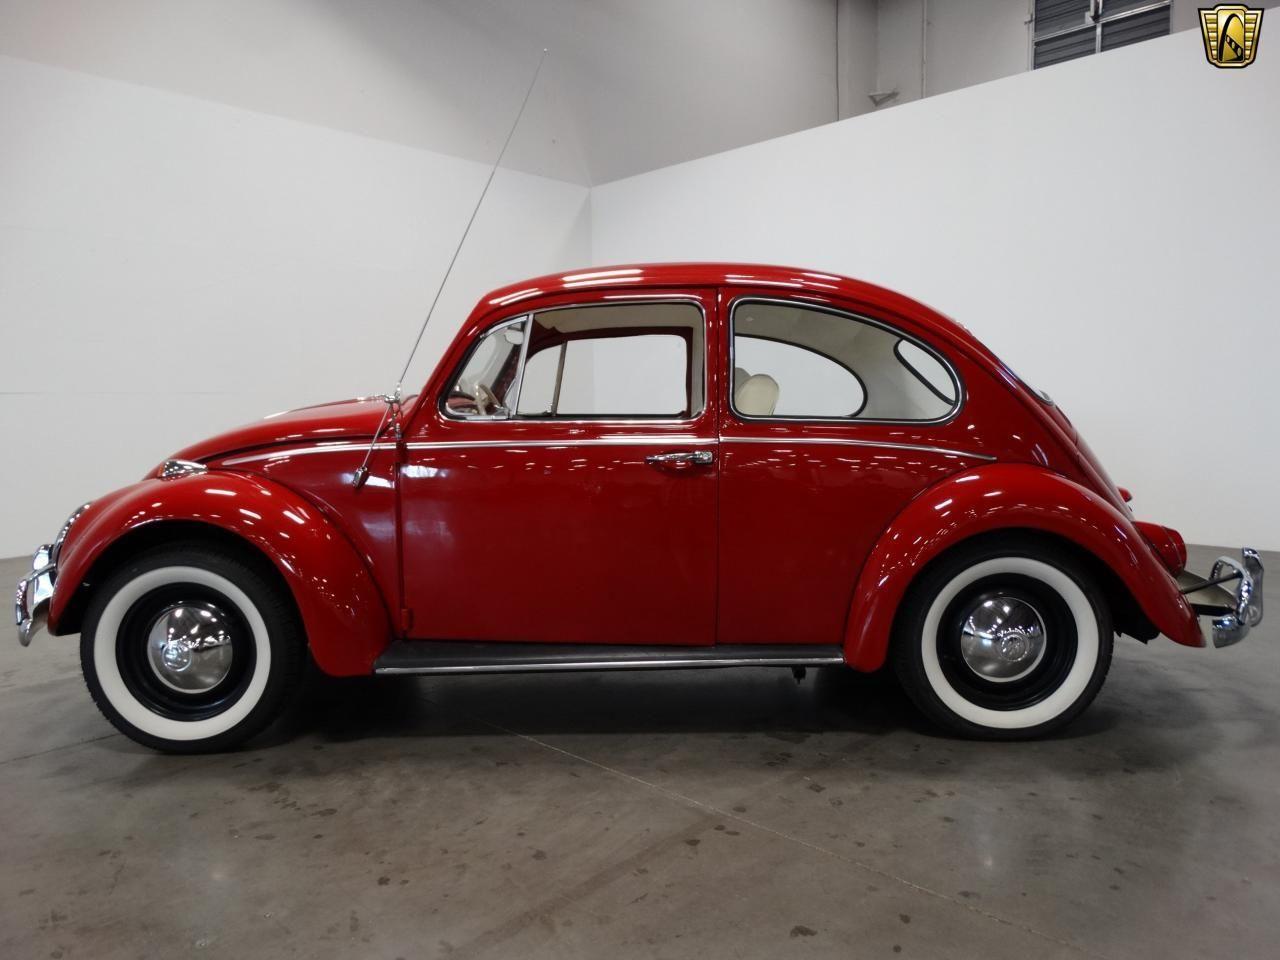 used 1965 volkswagen beetle for sale beetles pinterest beetles volkswagen and vw. Black Bedroom Furniture Sets. Home Design Ideas